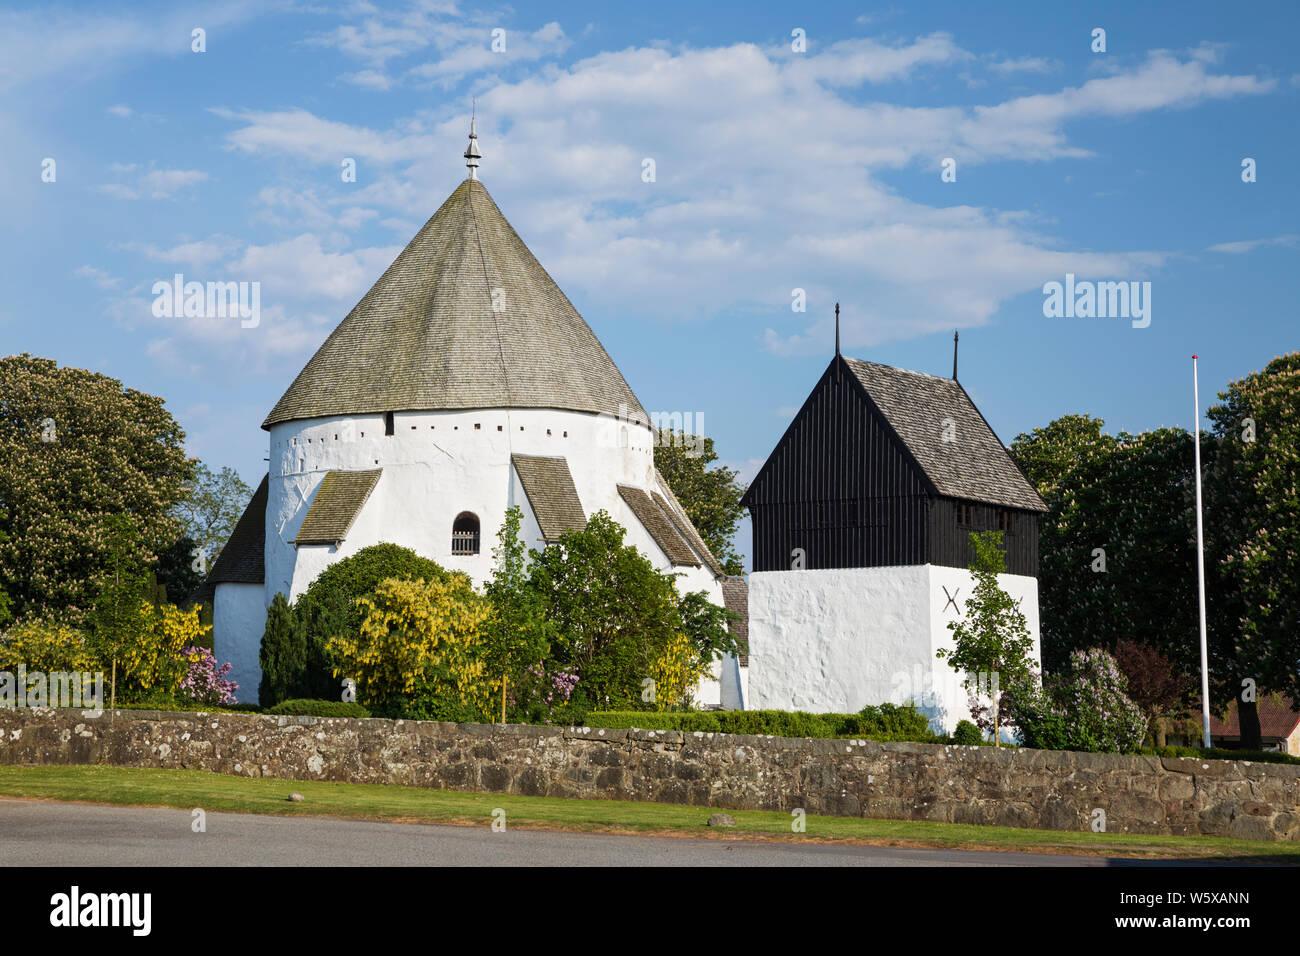 L'église ronde Osterlars Osterlars, et clocher, Bornholm, la mer Baltique, Danemark, Europe Banque D'Images